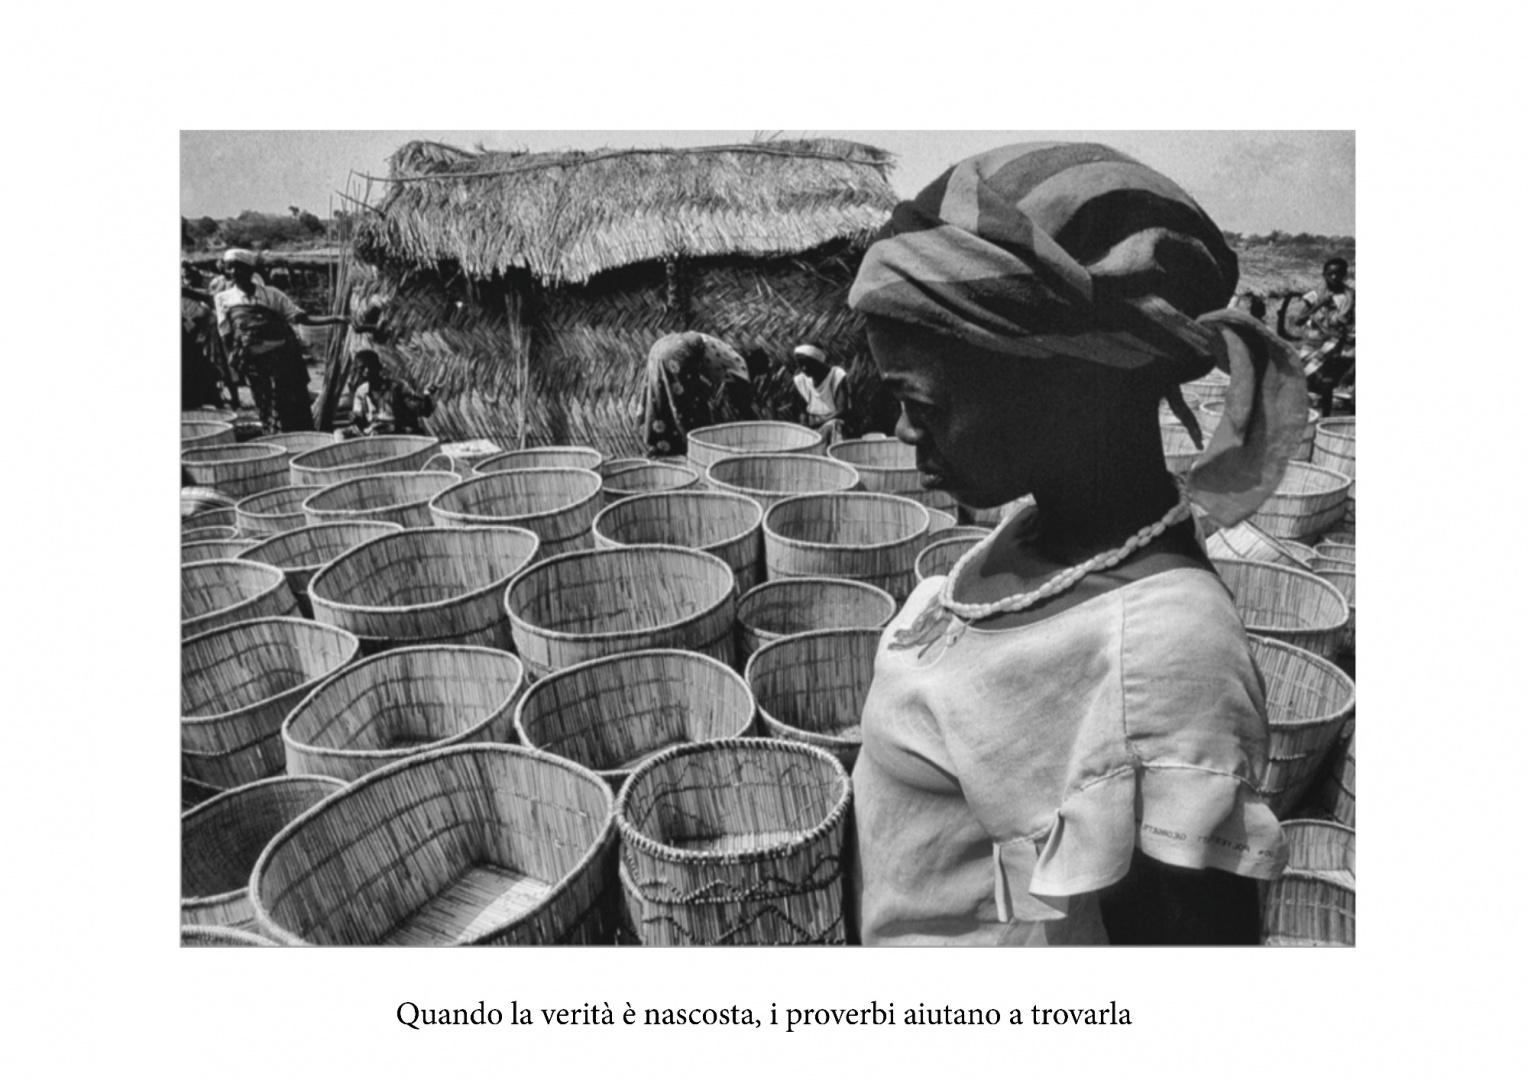 77_Proverbi_africani-730-1920-1080-95